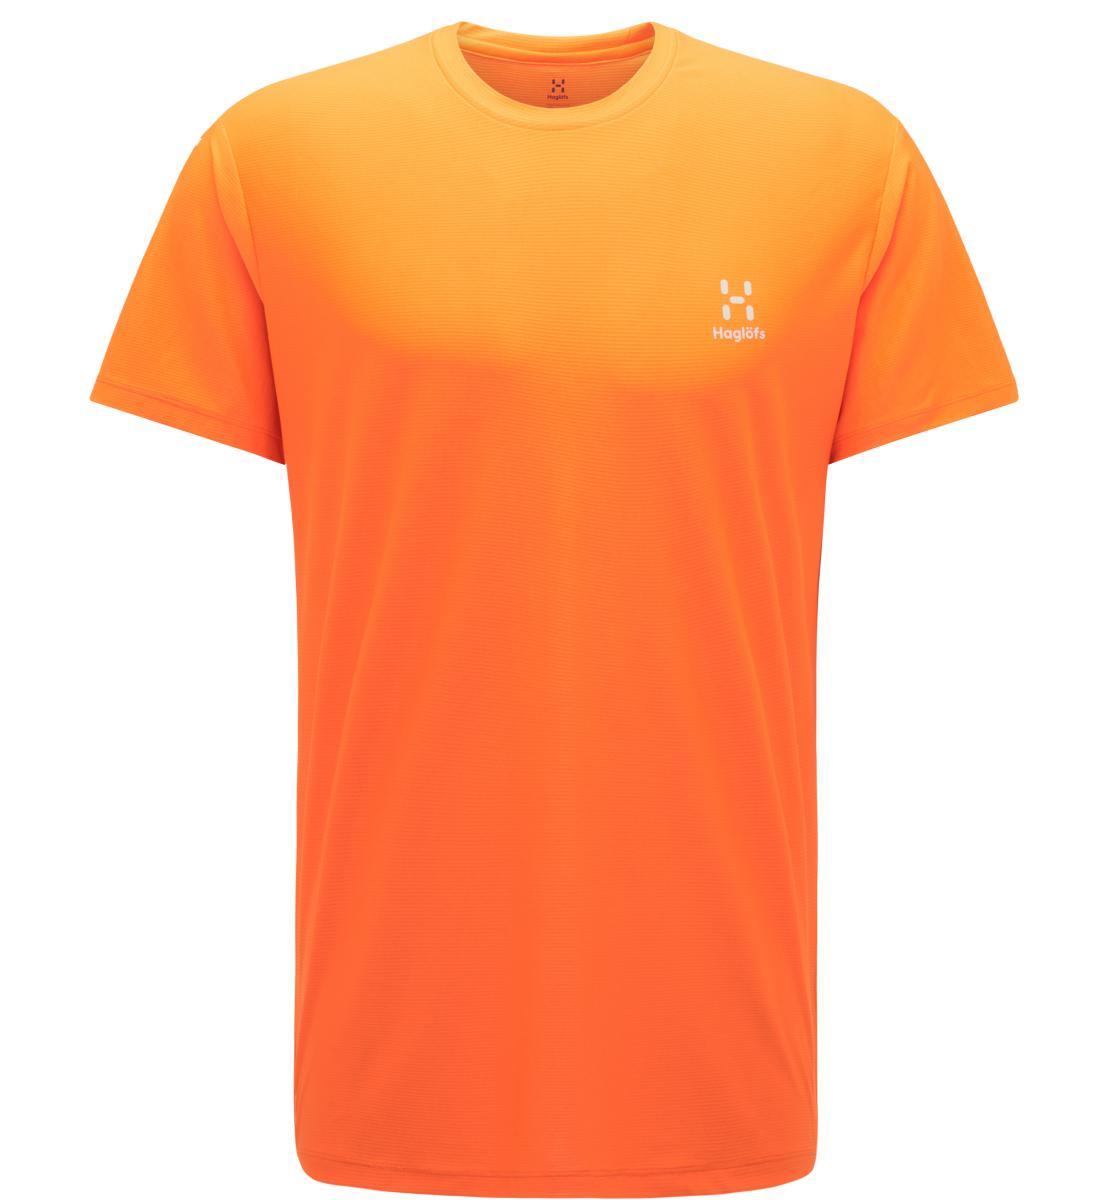 Haglöfs  L.I.M Tech Tee Men, t-skjorte, herre